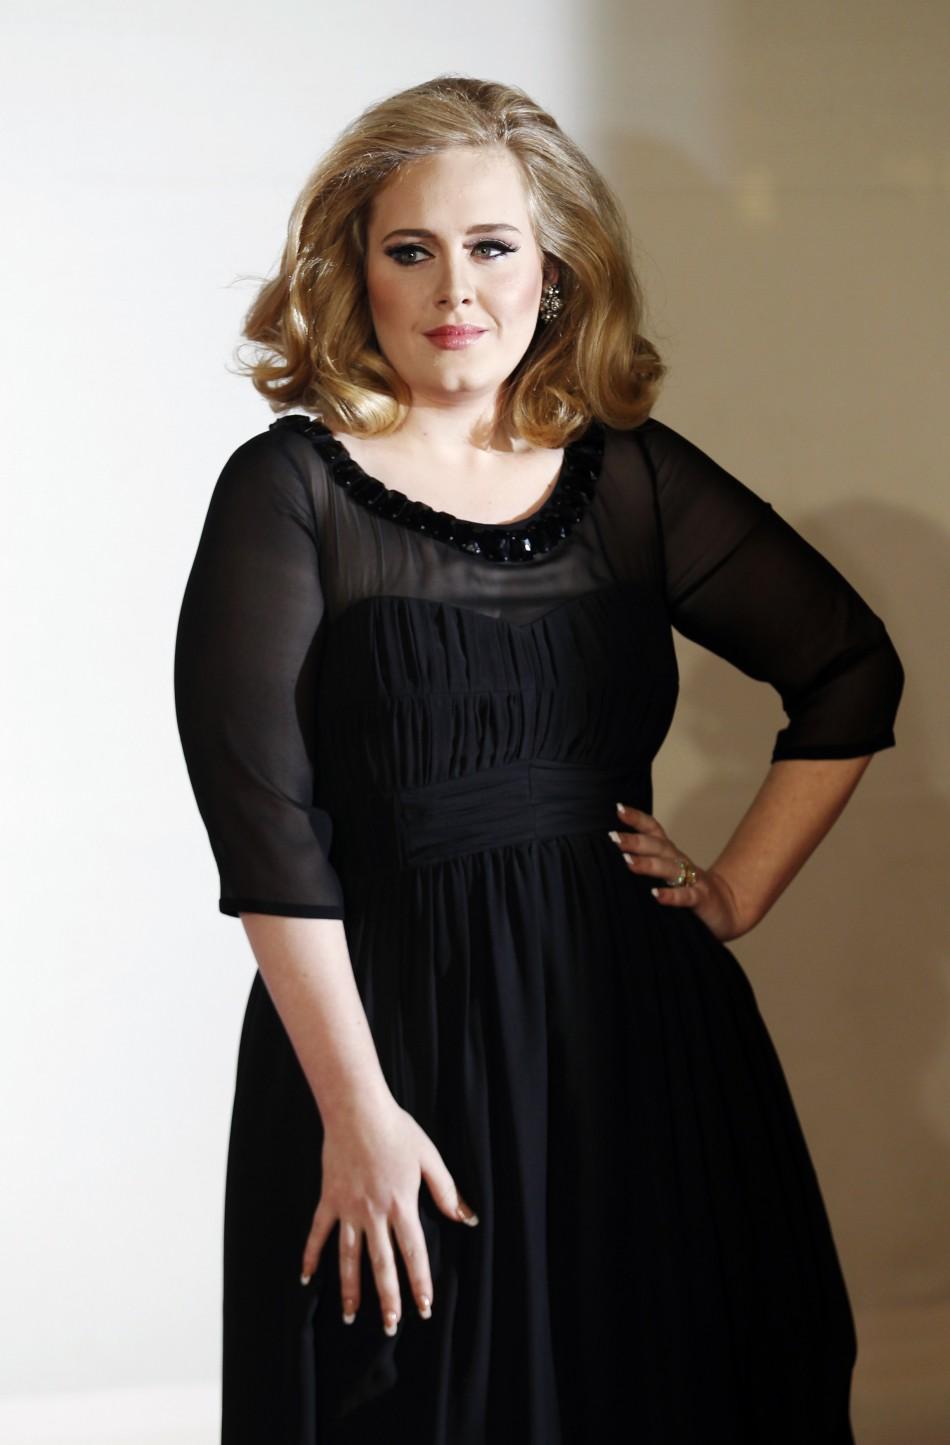 British Singer Adele Crowned Pop Gay Icon, Gaydar Radio's